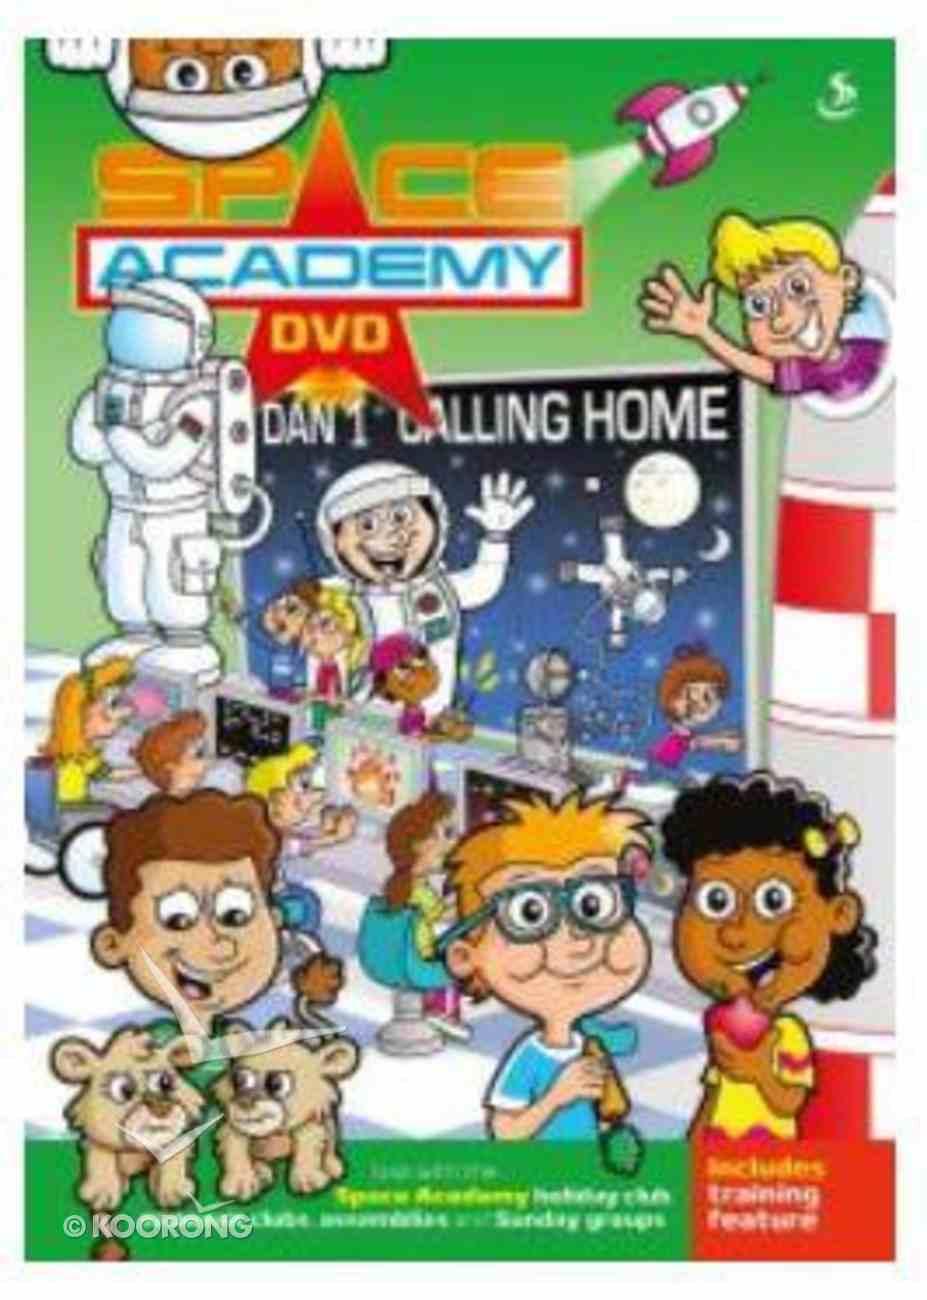 Holiday Club 2013: Space Academy (Dvd) DVD